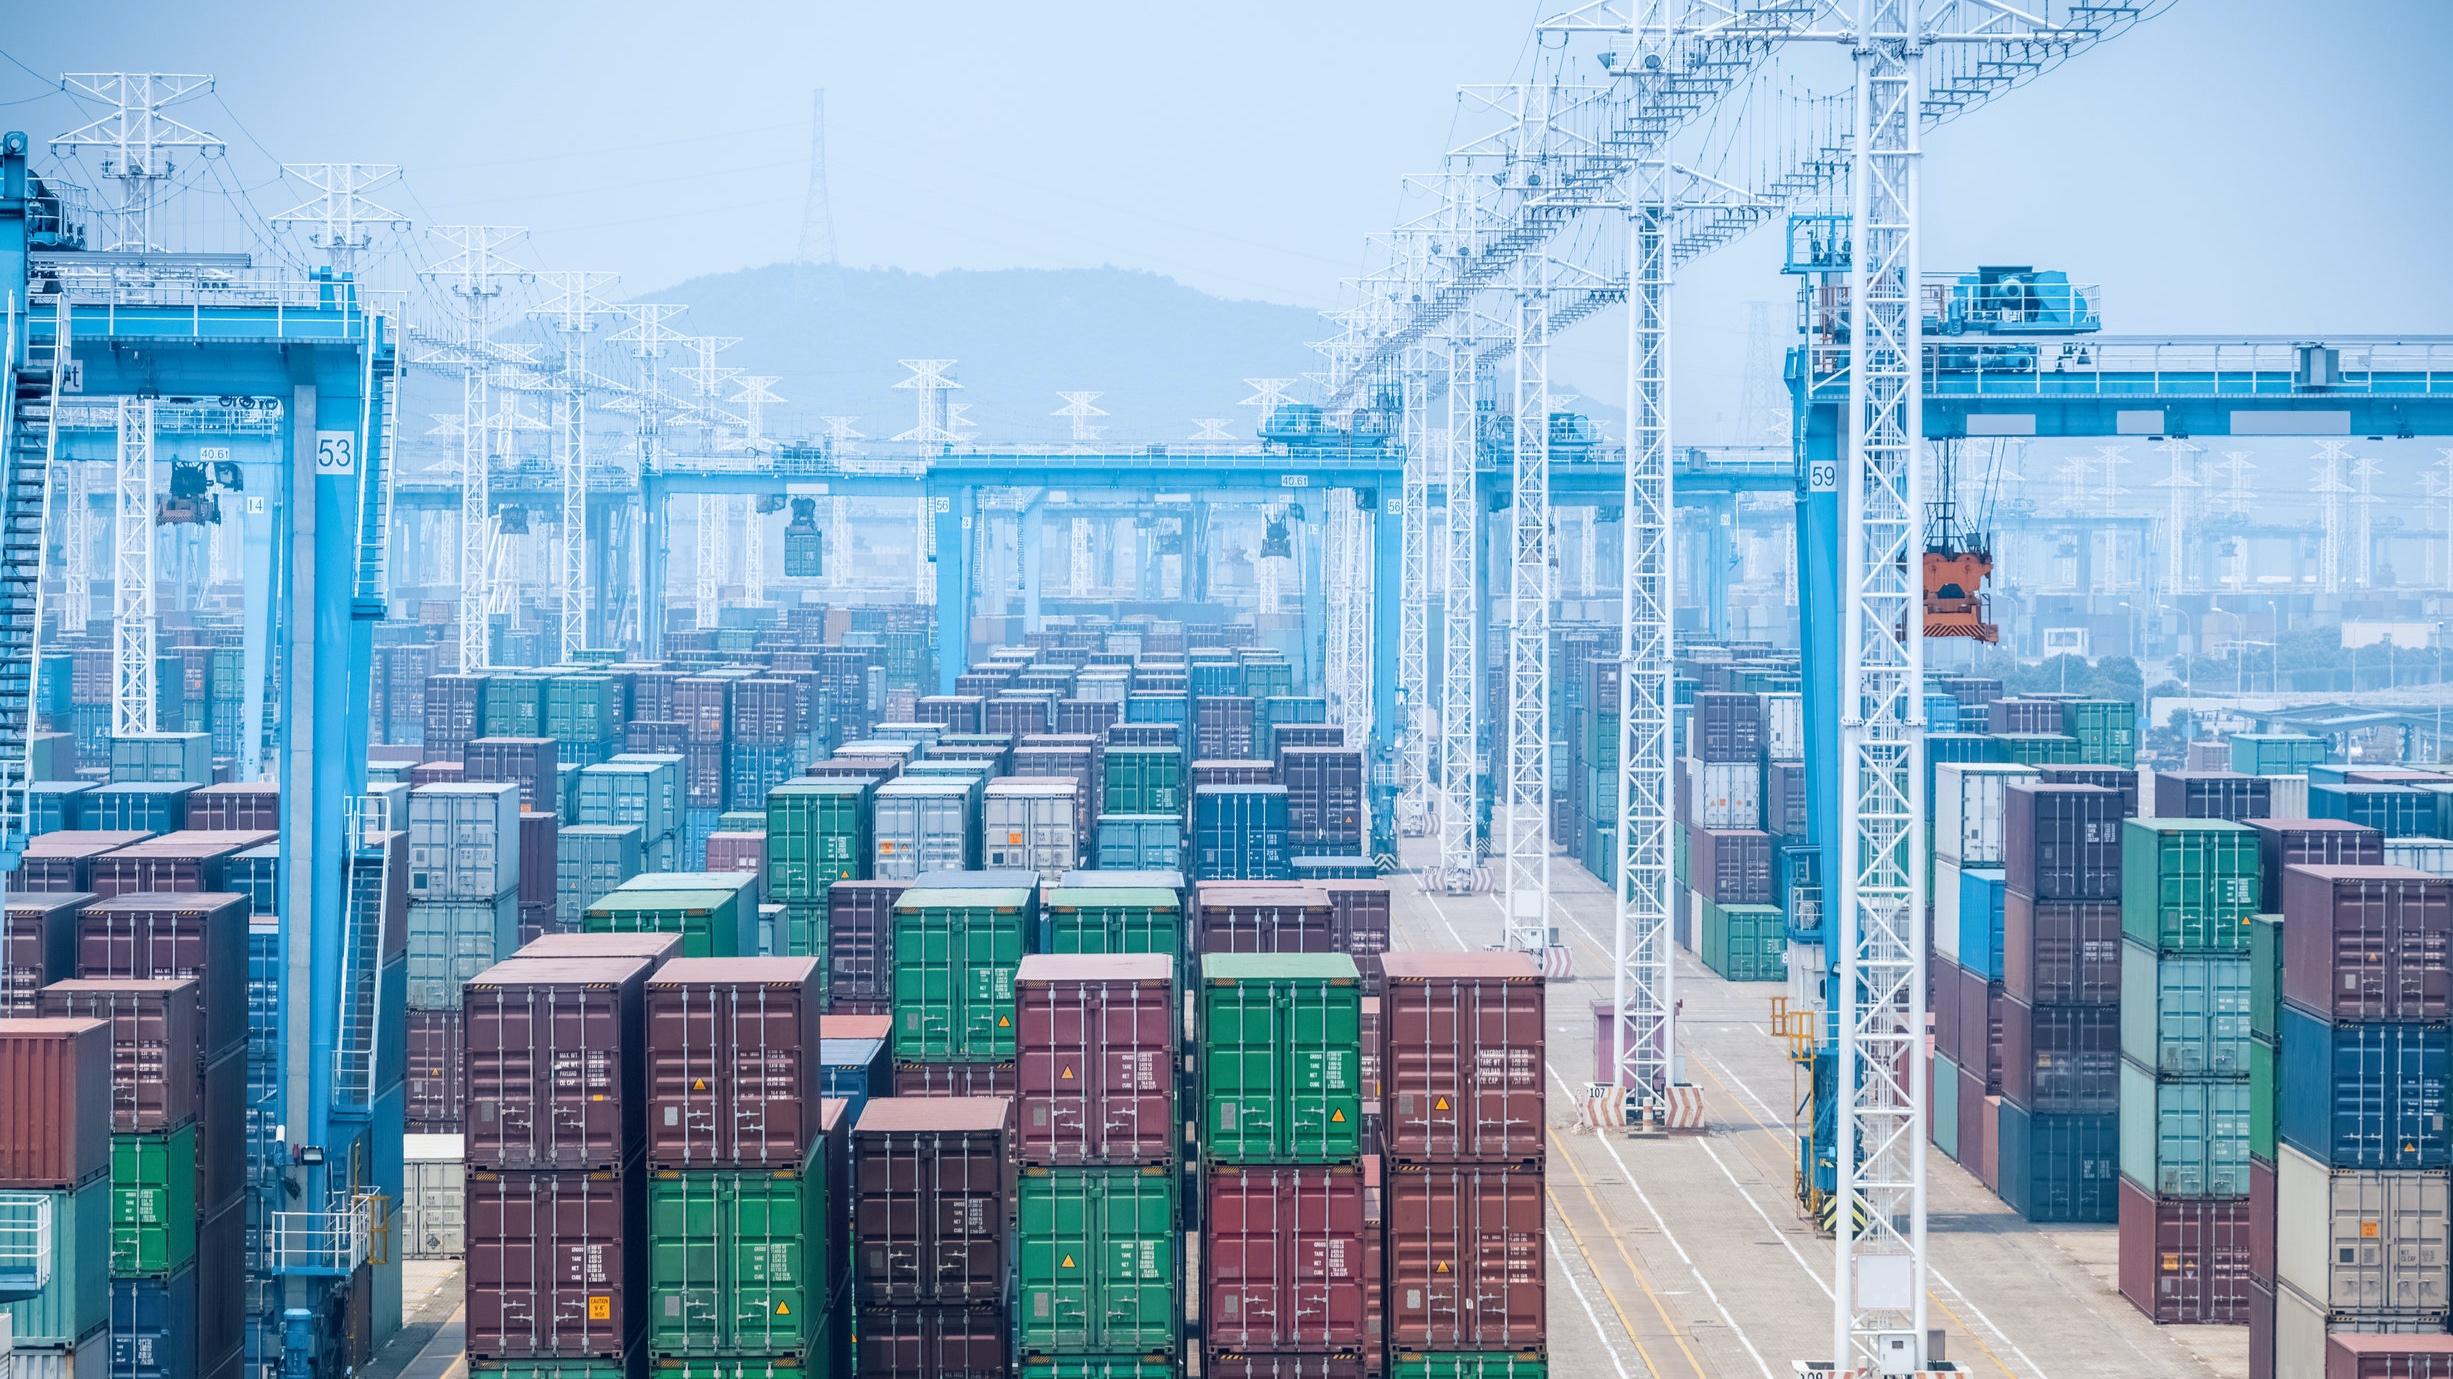 container-yard-closeup-PGVQRBB.jpg